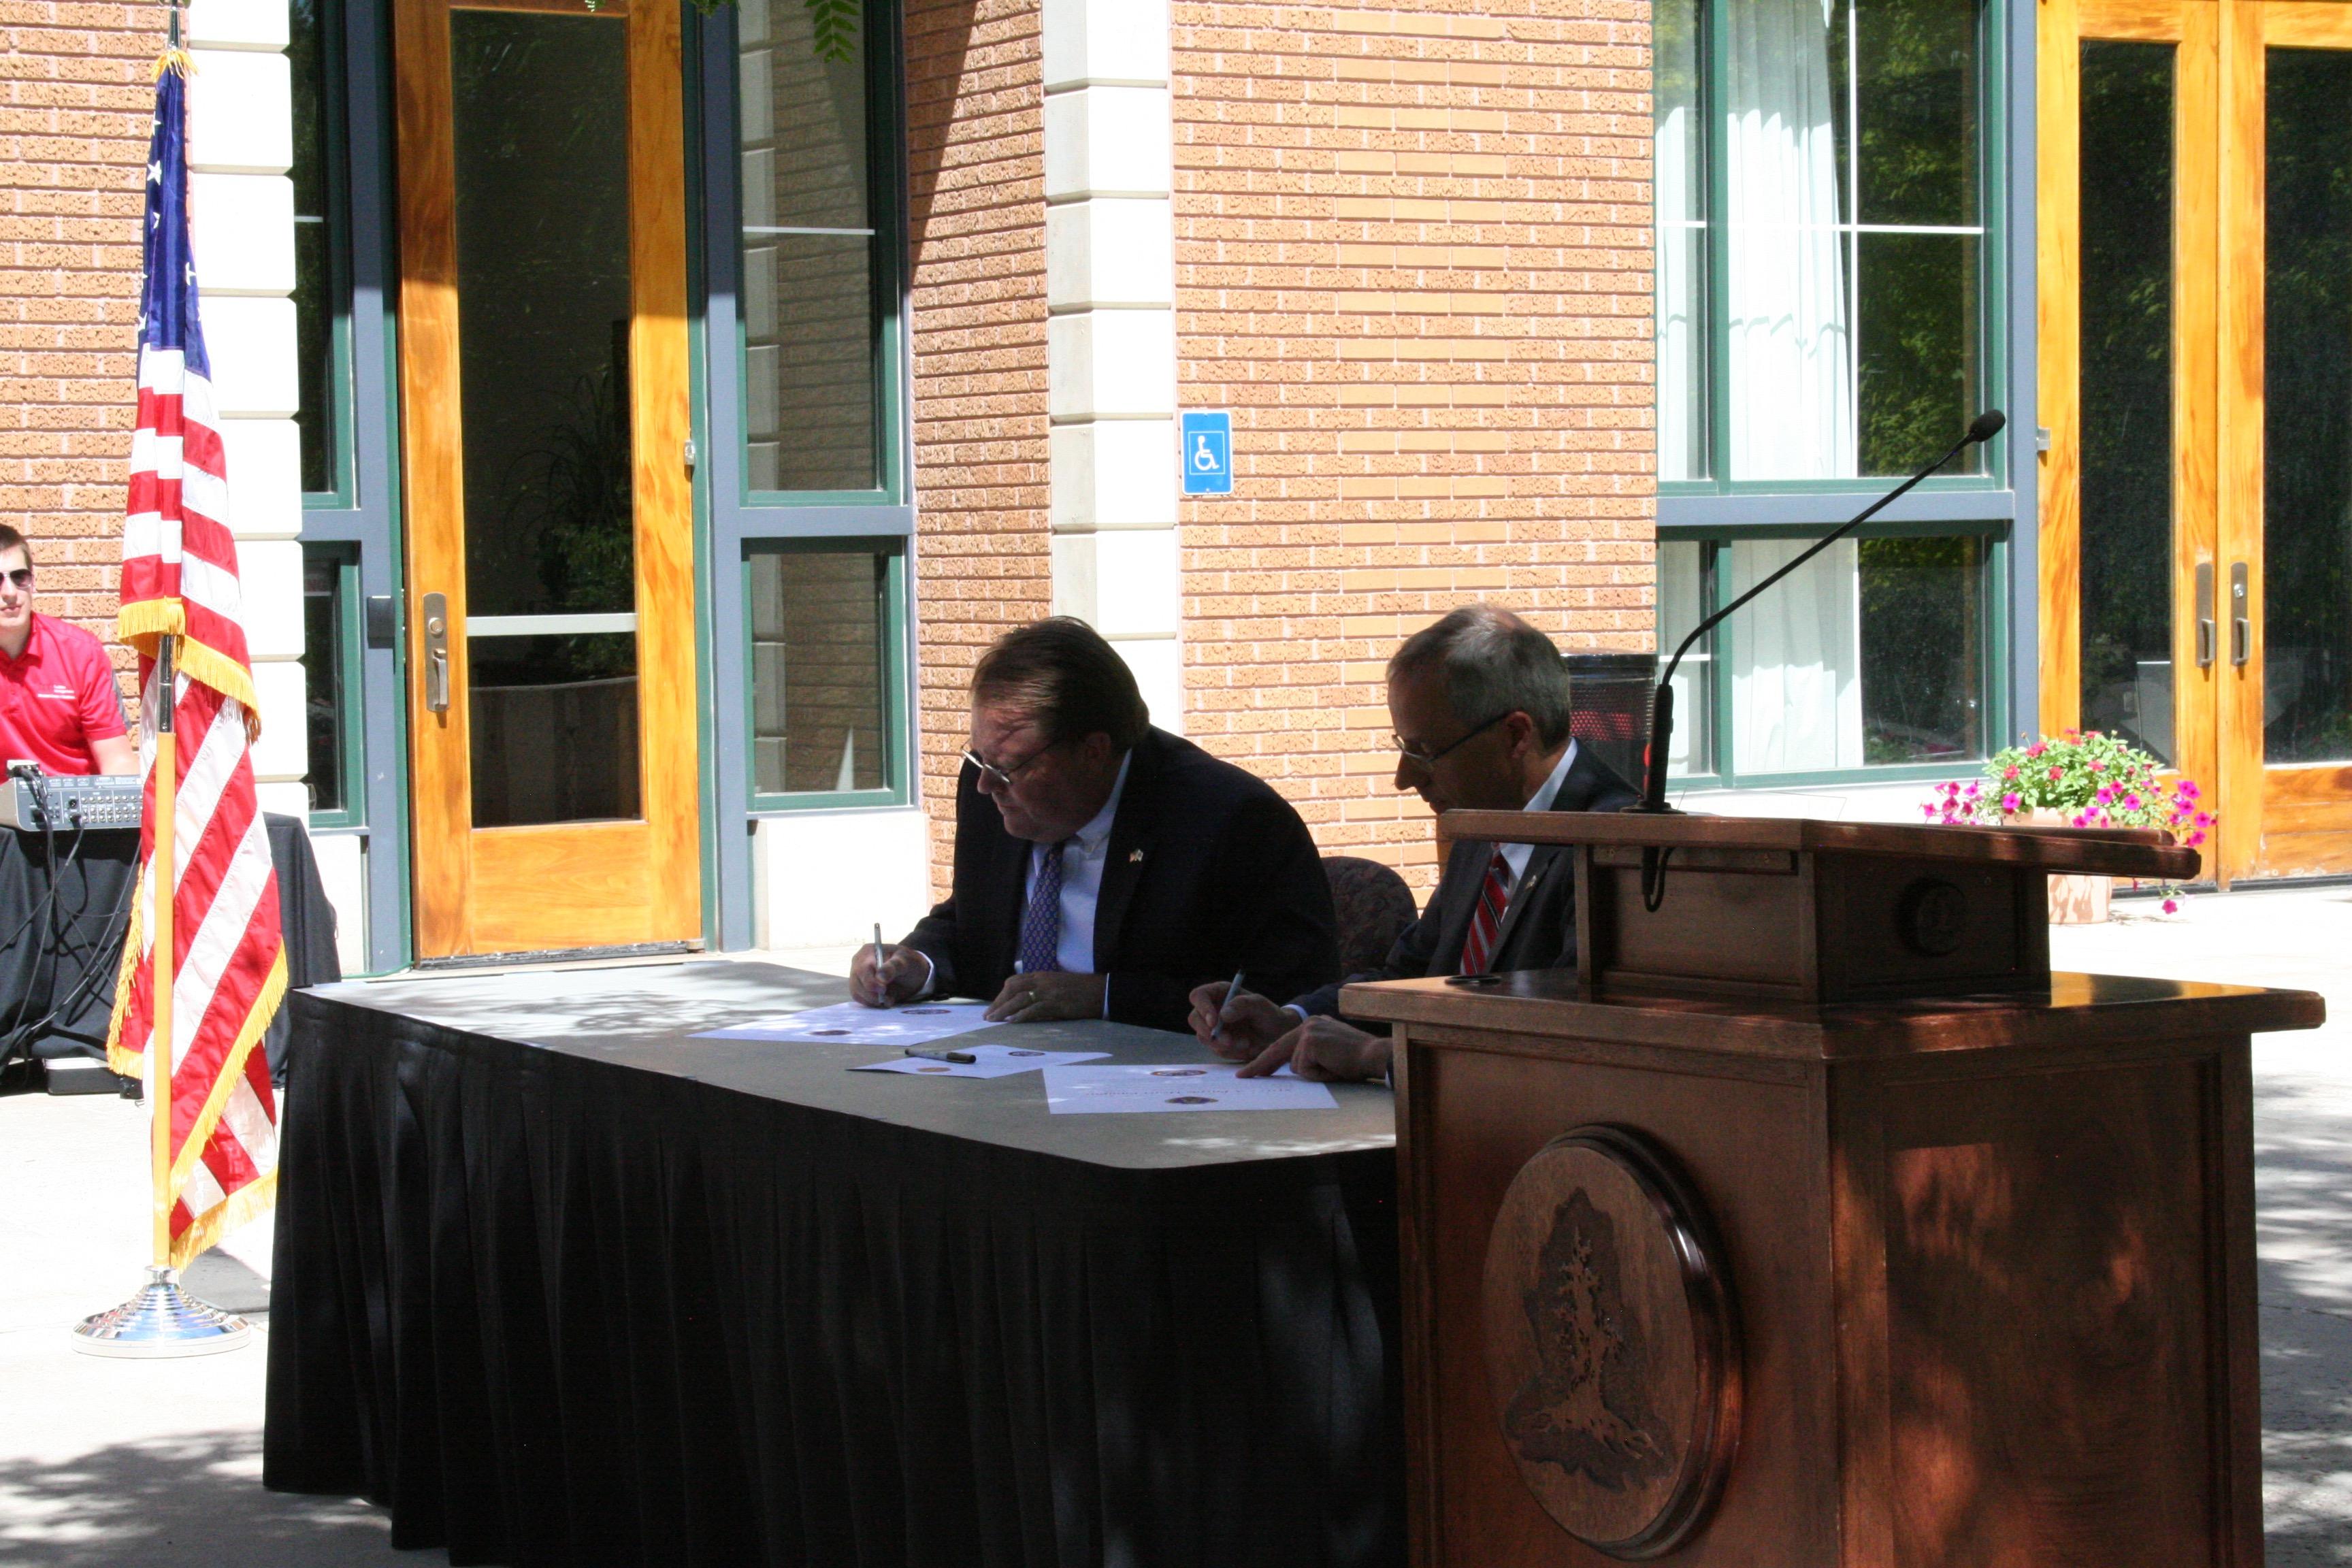 SUU President Scott Wyatt and Board of Trustees Chairman Eric Leavitt join to sign the official proclamation designating Southern Utah University a Purple Heart Campus, Cedar City, Utah, June 24, 2016   Photo by Kaleigh Bronson, St. George News / Cedar City News